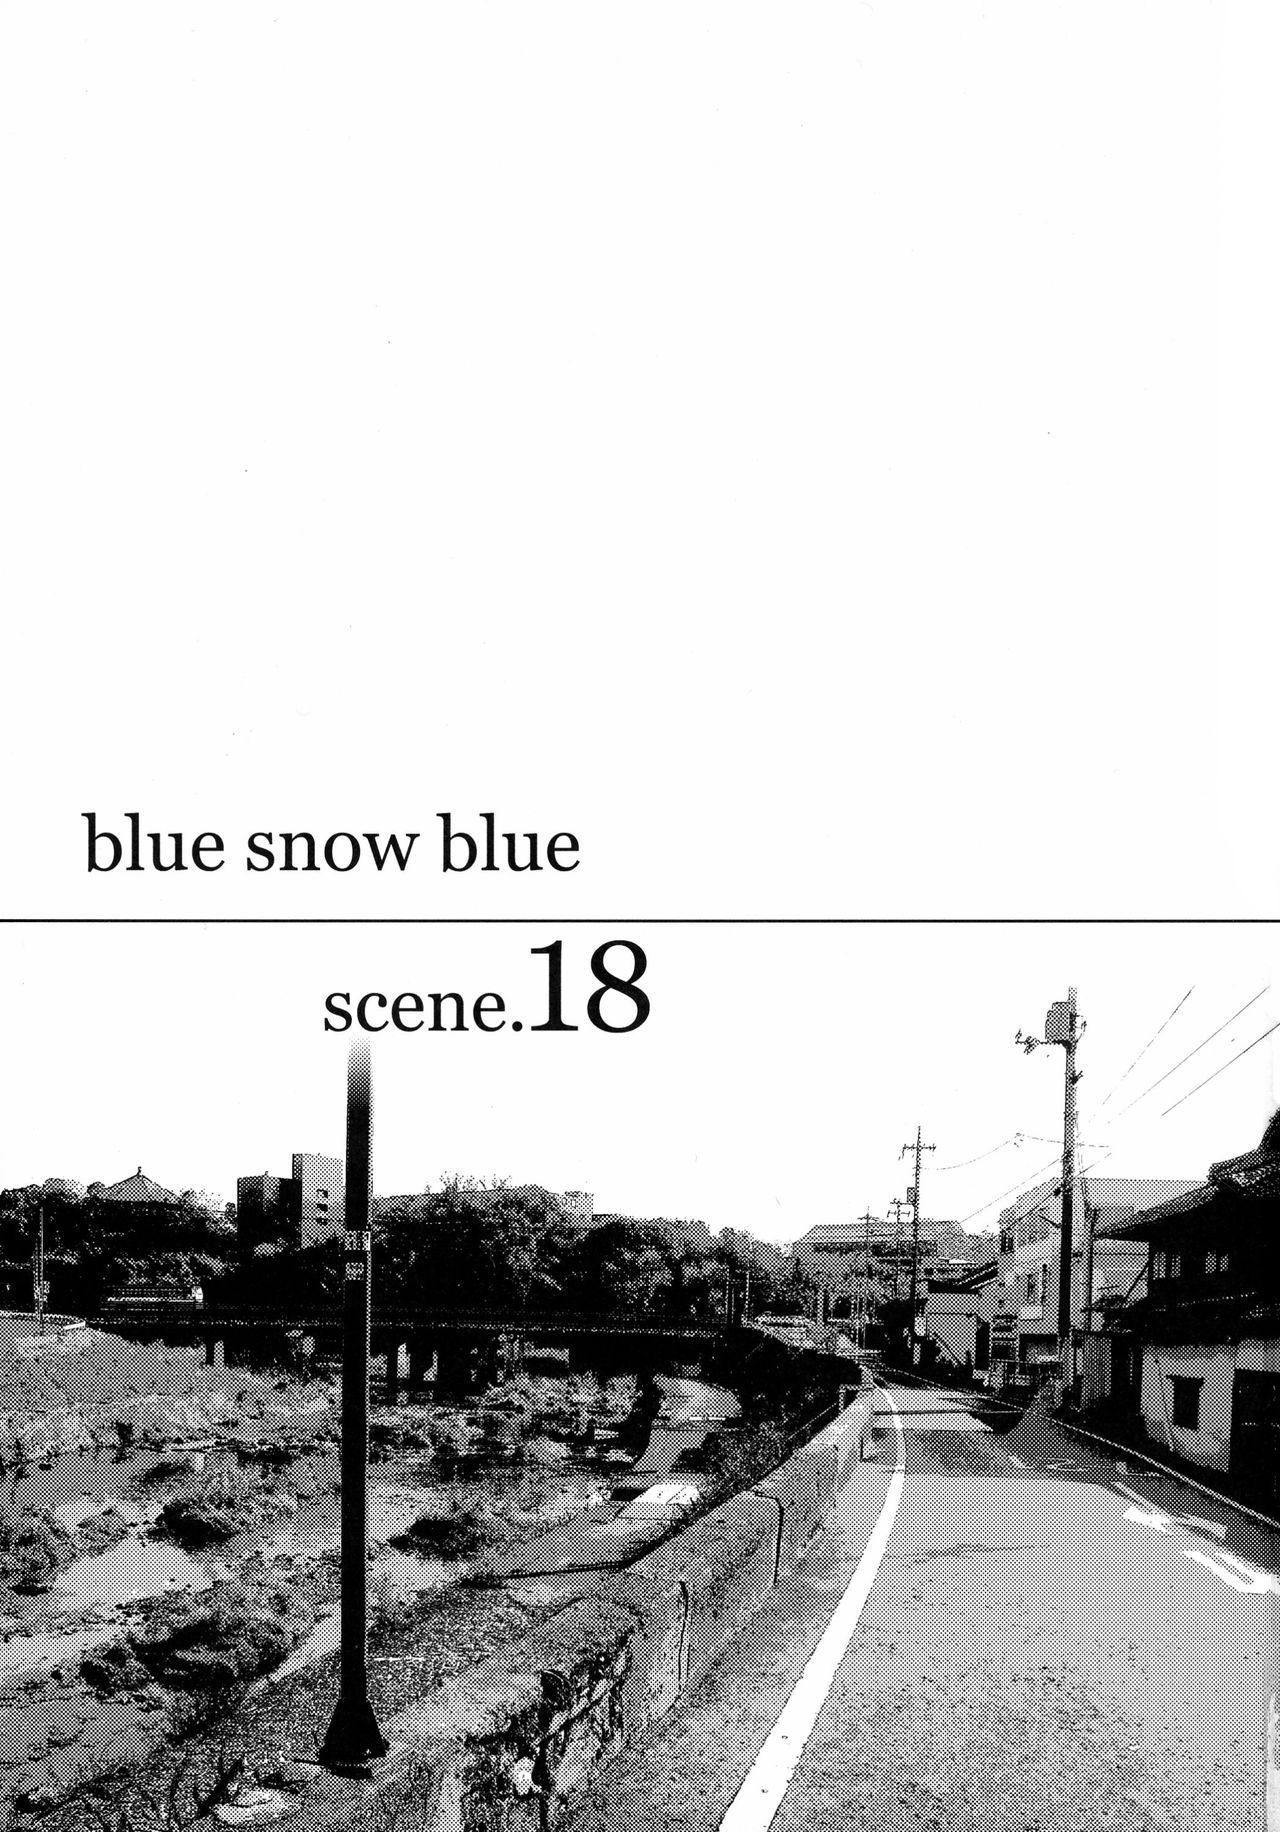 blue snow blue scene.18 2